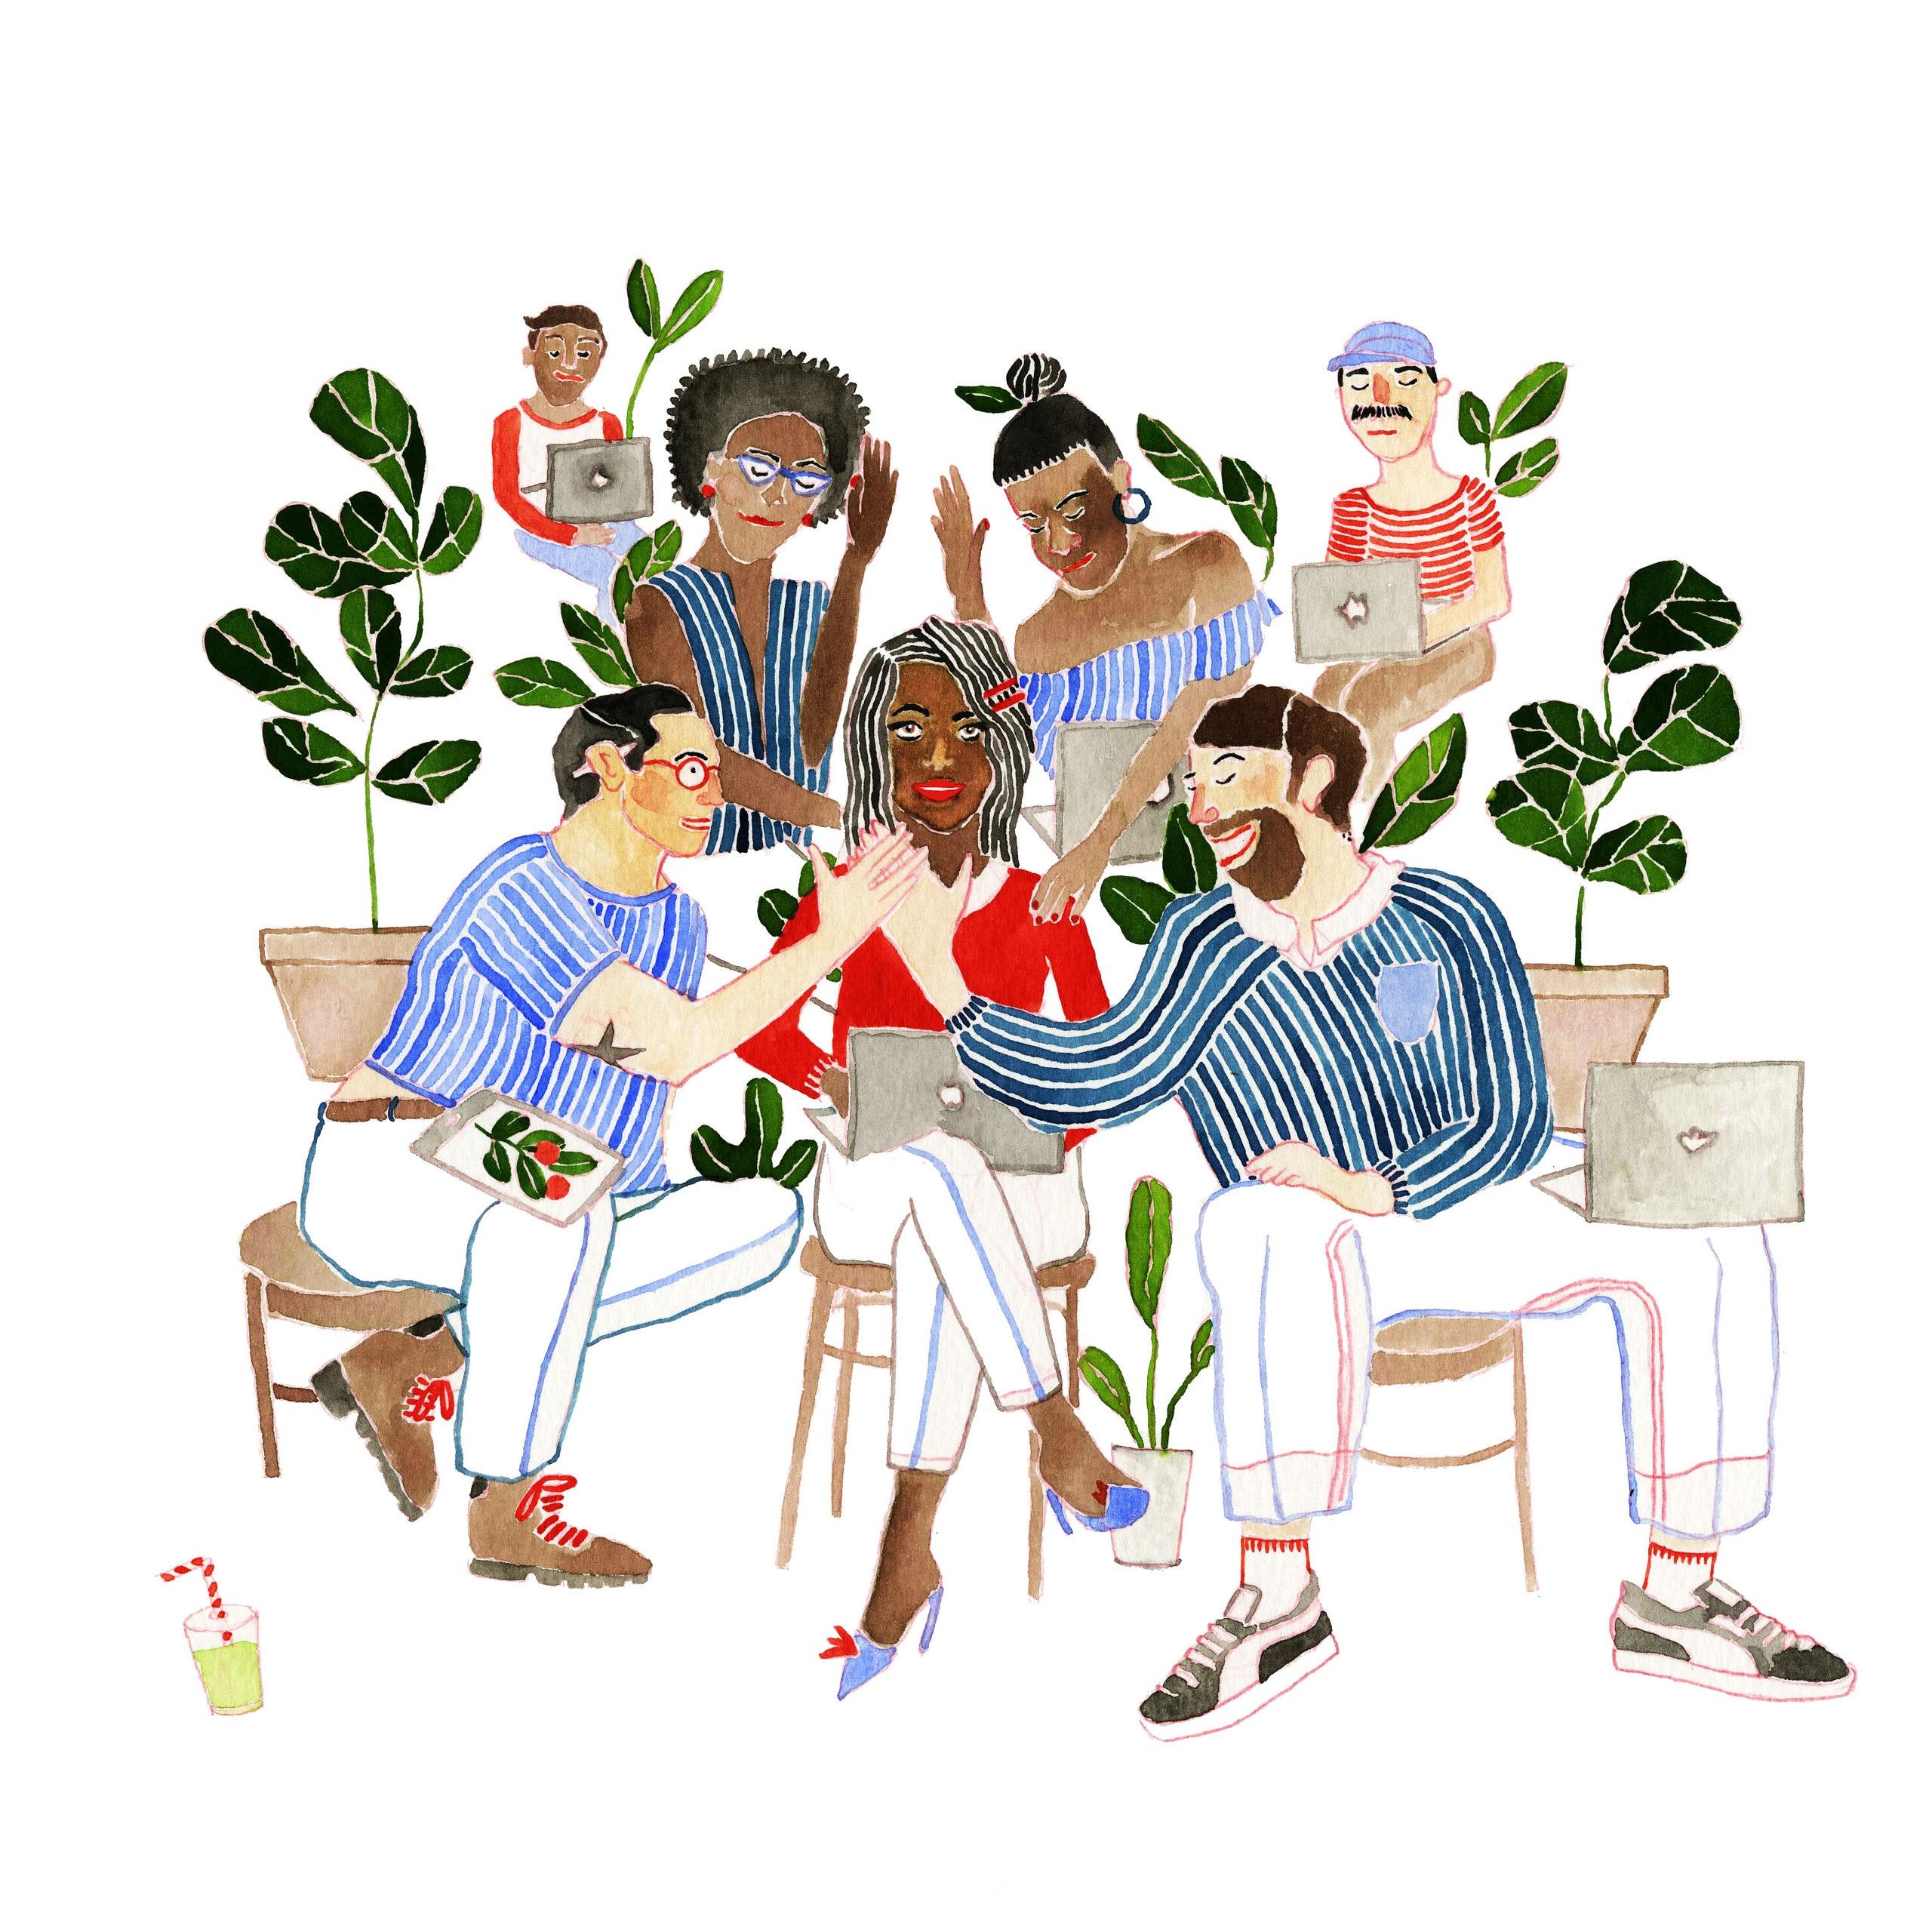 How I Found Sisterhood in an Industry With Few Women